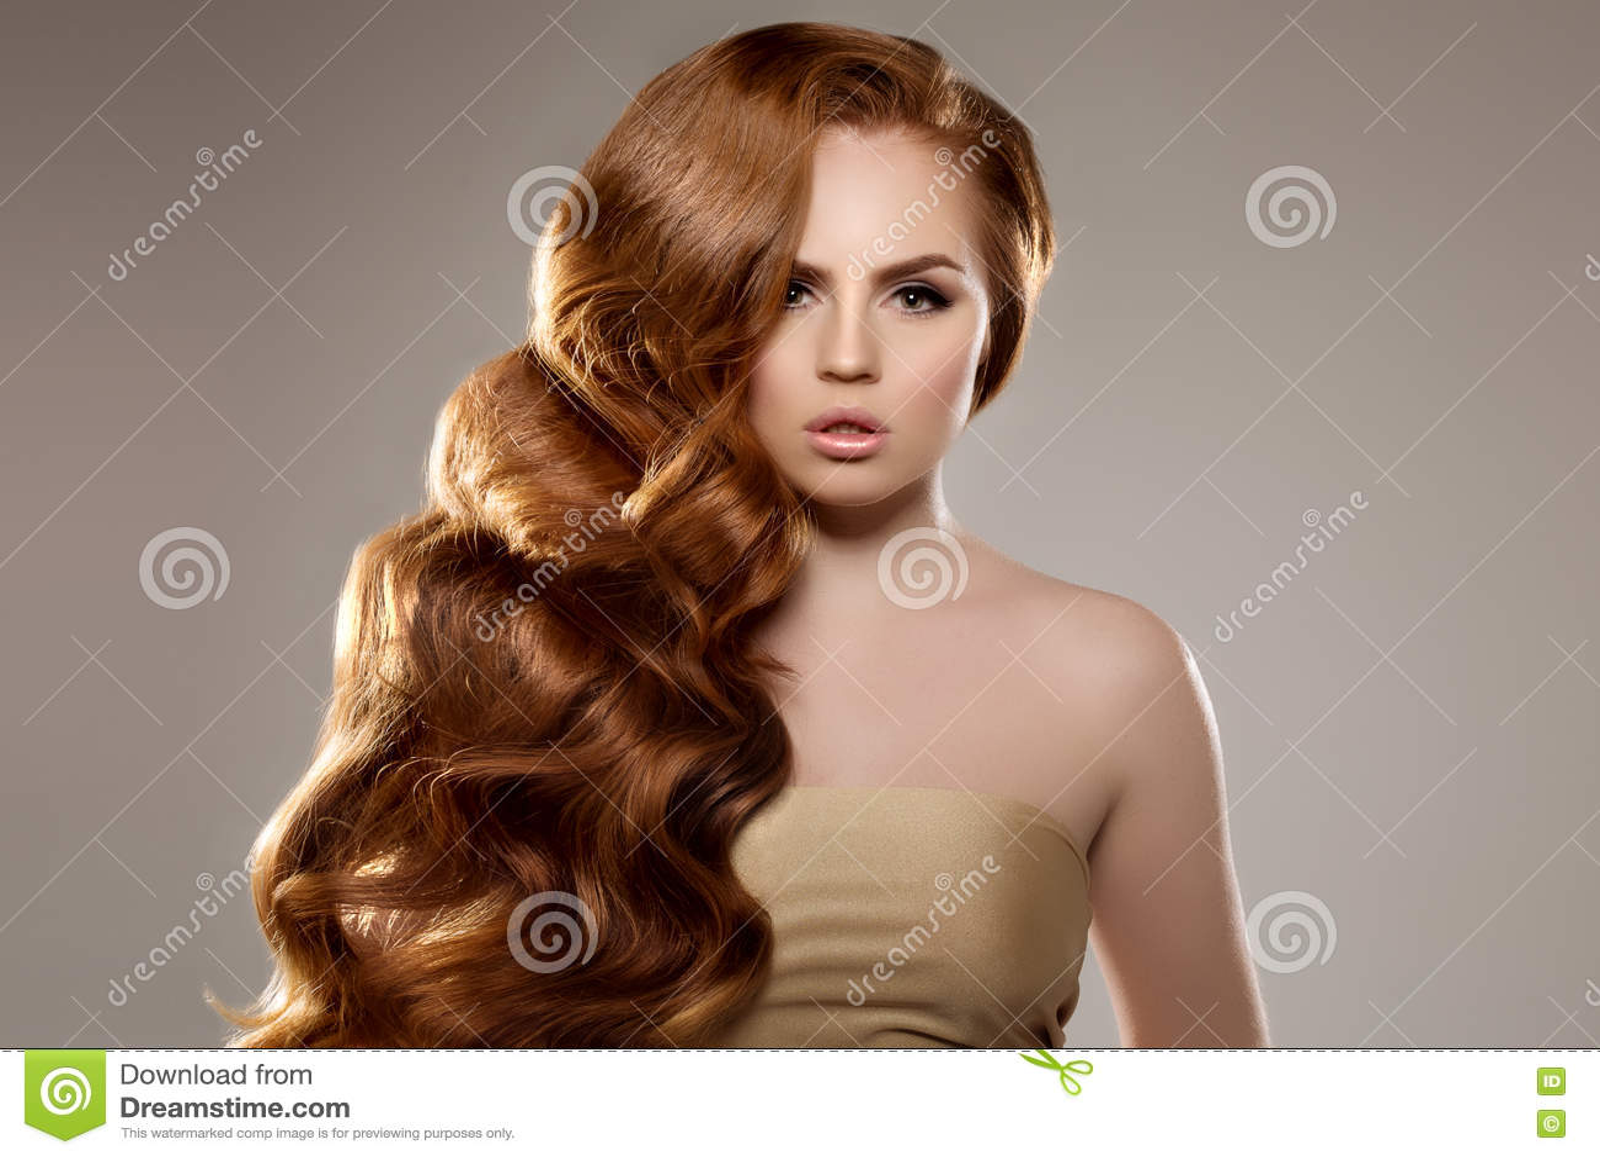 Modell Mit Dem Langen Roten Haar Wellen Locken Frisur Schonheits